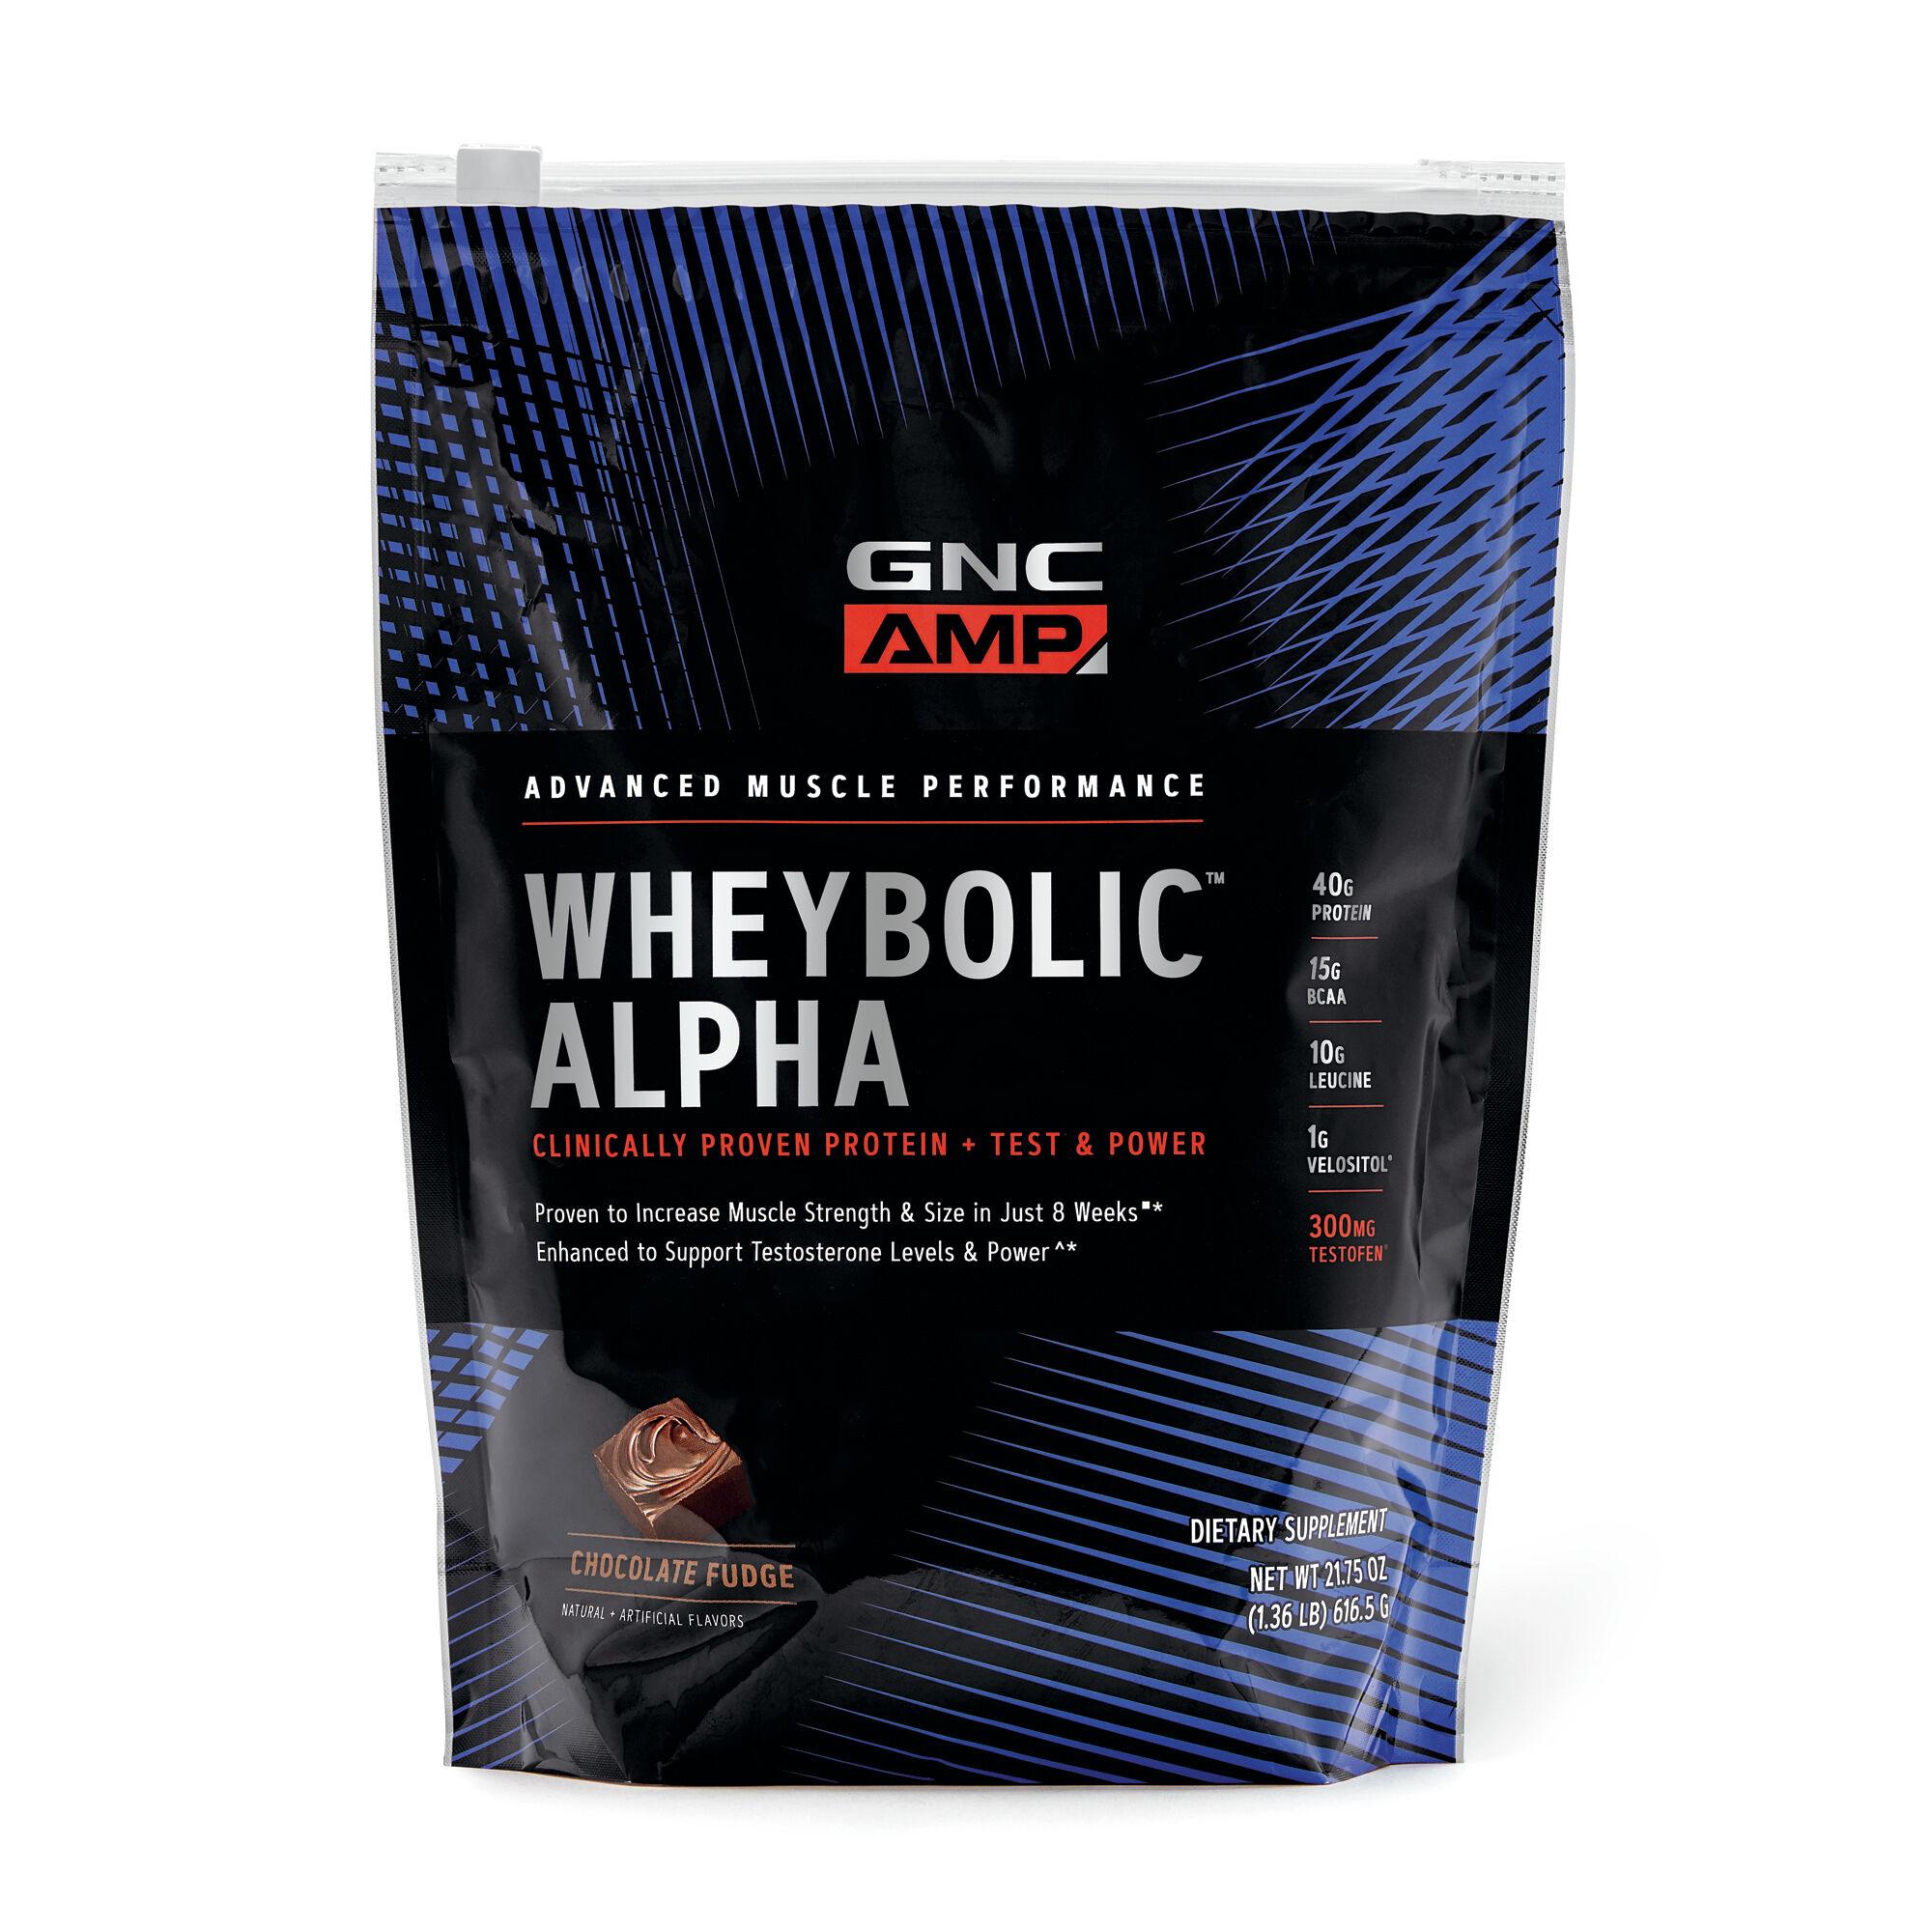 GNC AMP Wheybolic™ Alpha